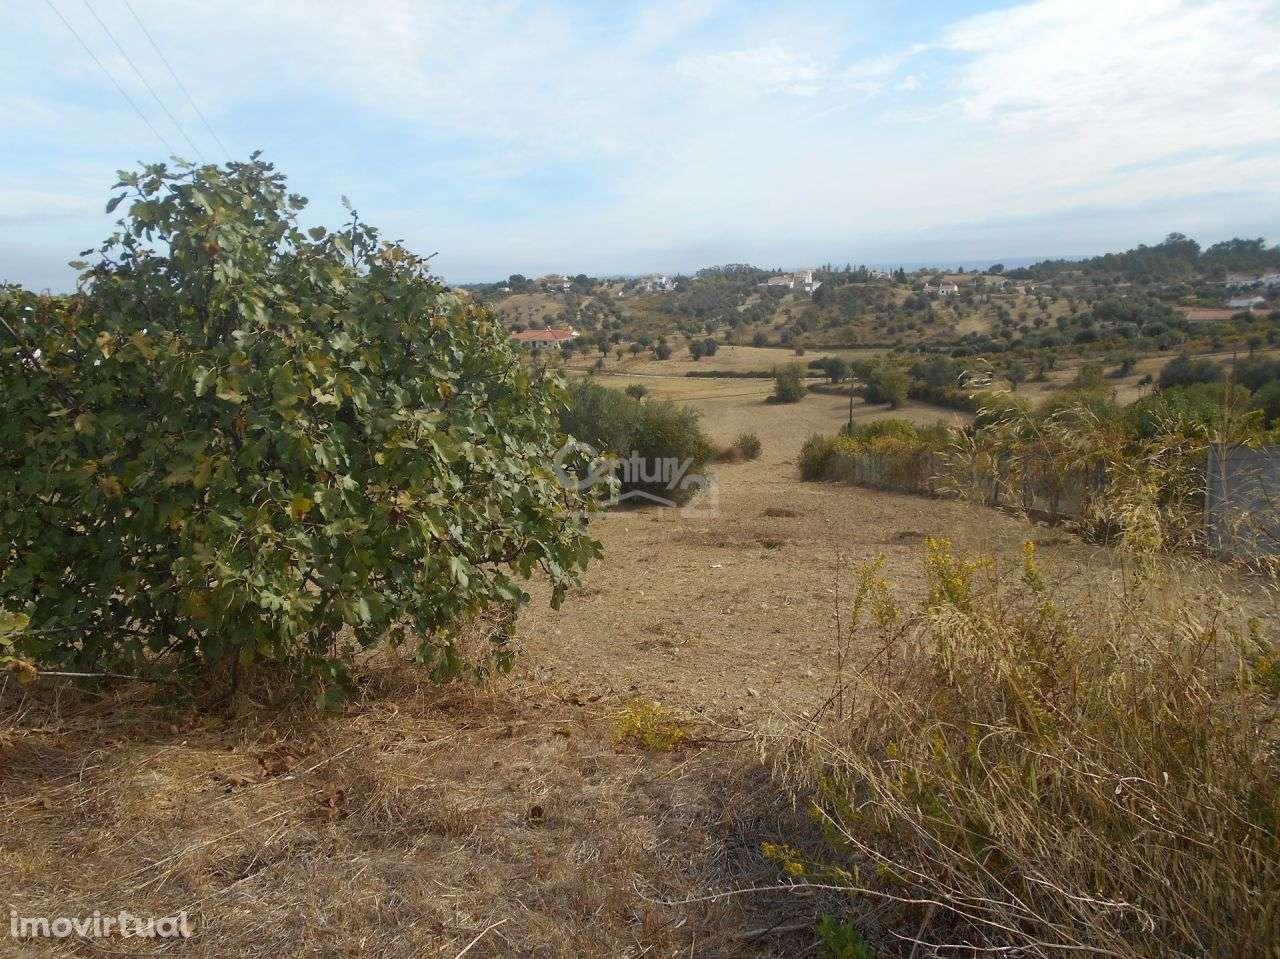 Terreno para comprar, Brogueira, Parceiros de Igreja e Alcorochel, Torres Novas, Santarém - Foto 3